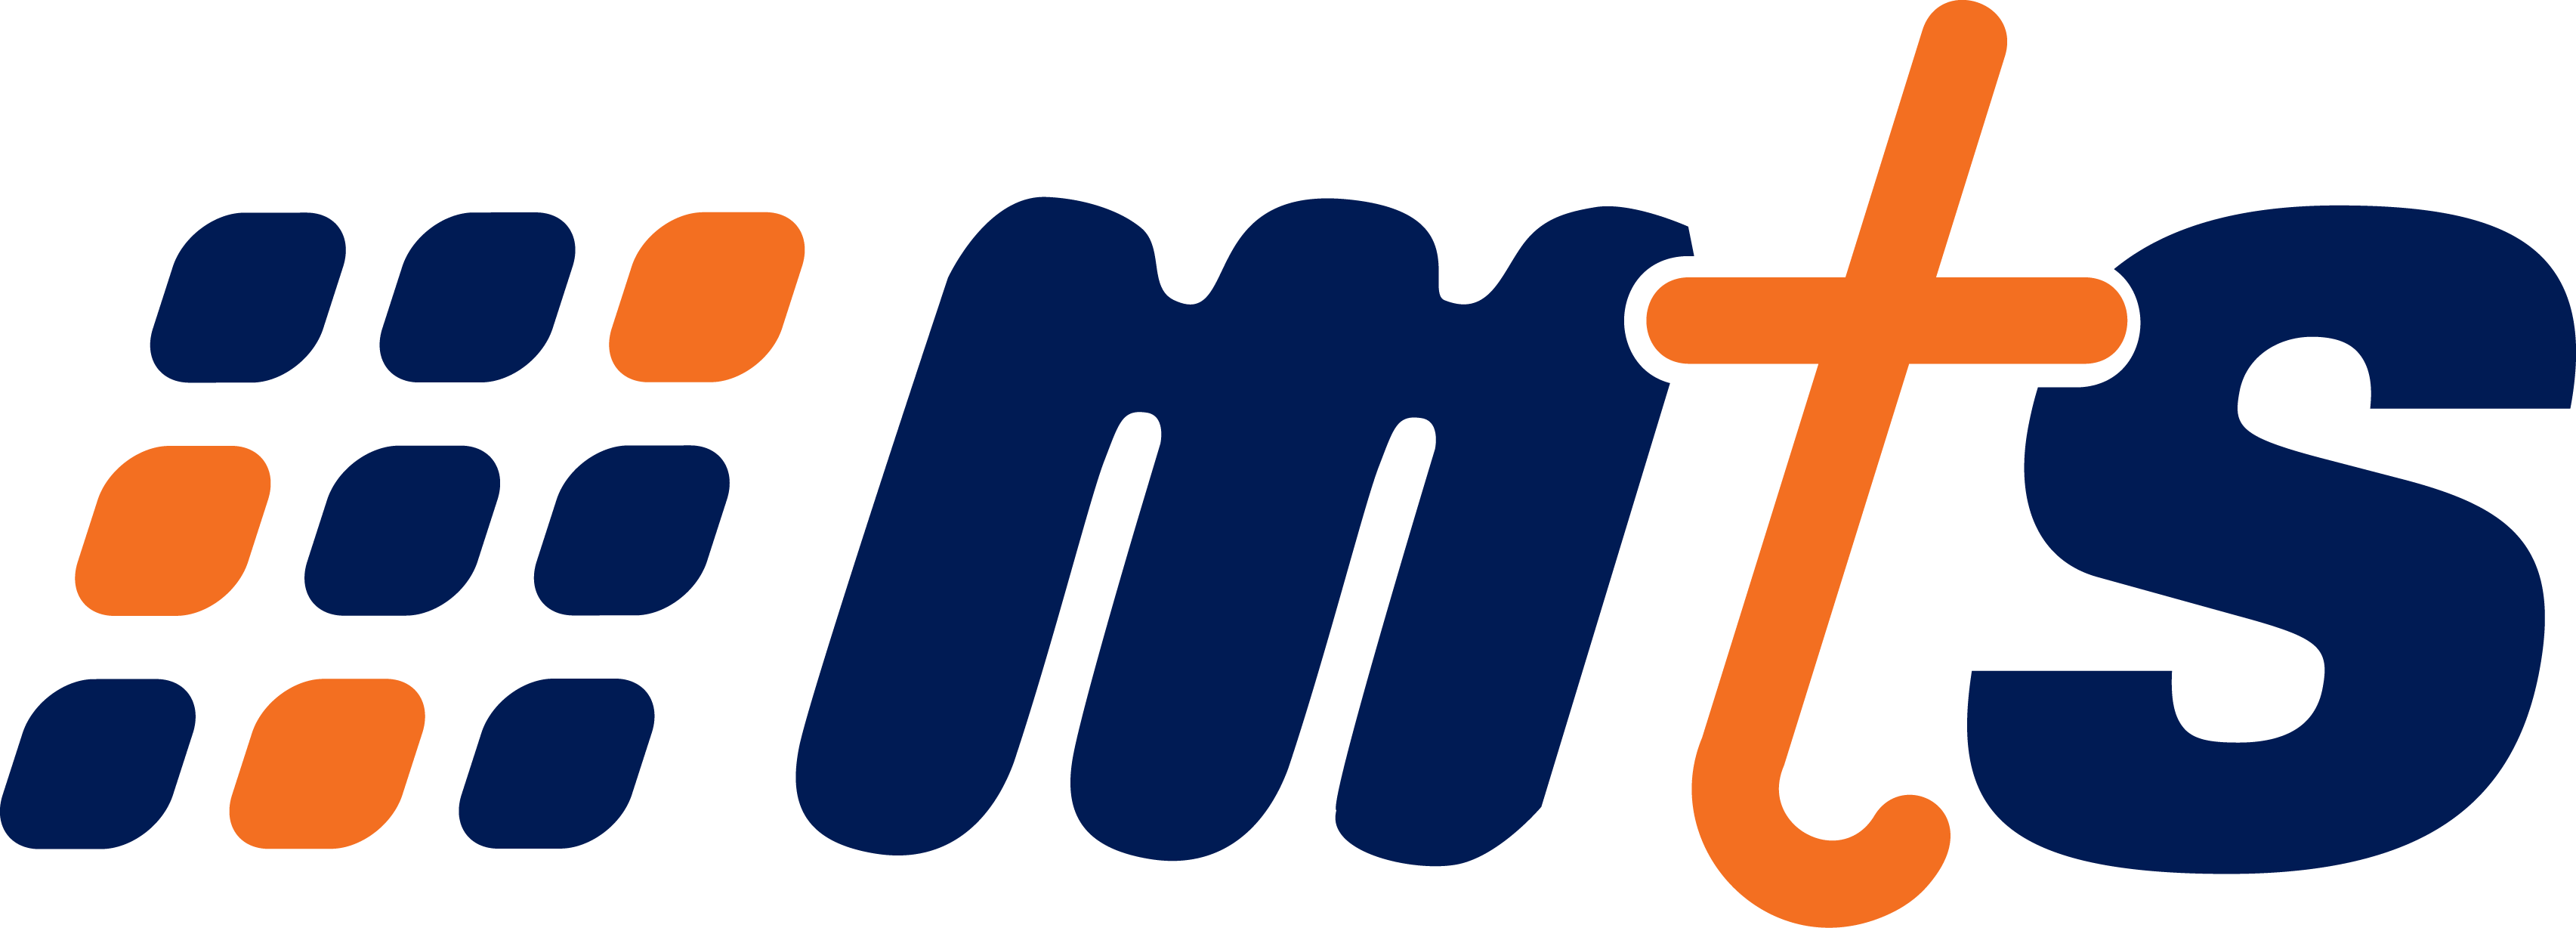 MTS_Logos_high_res2013.png